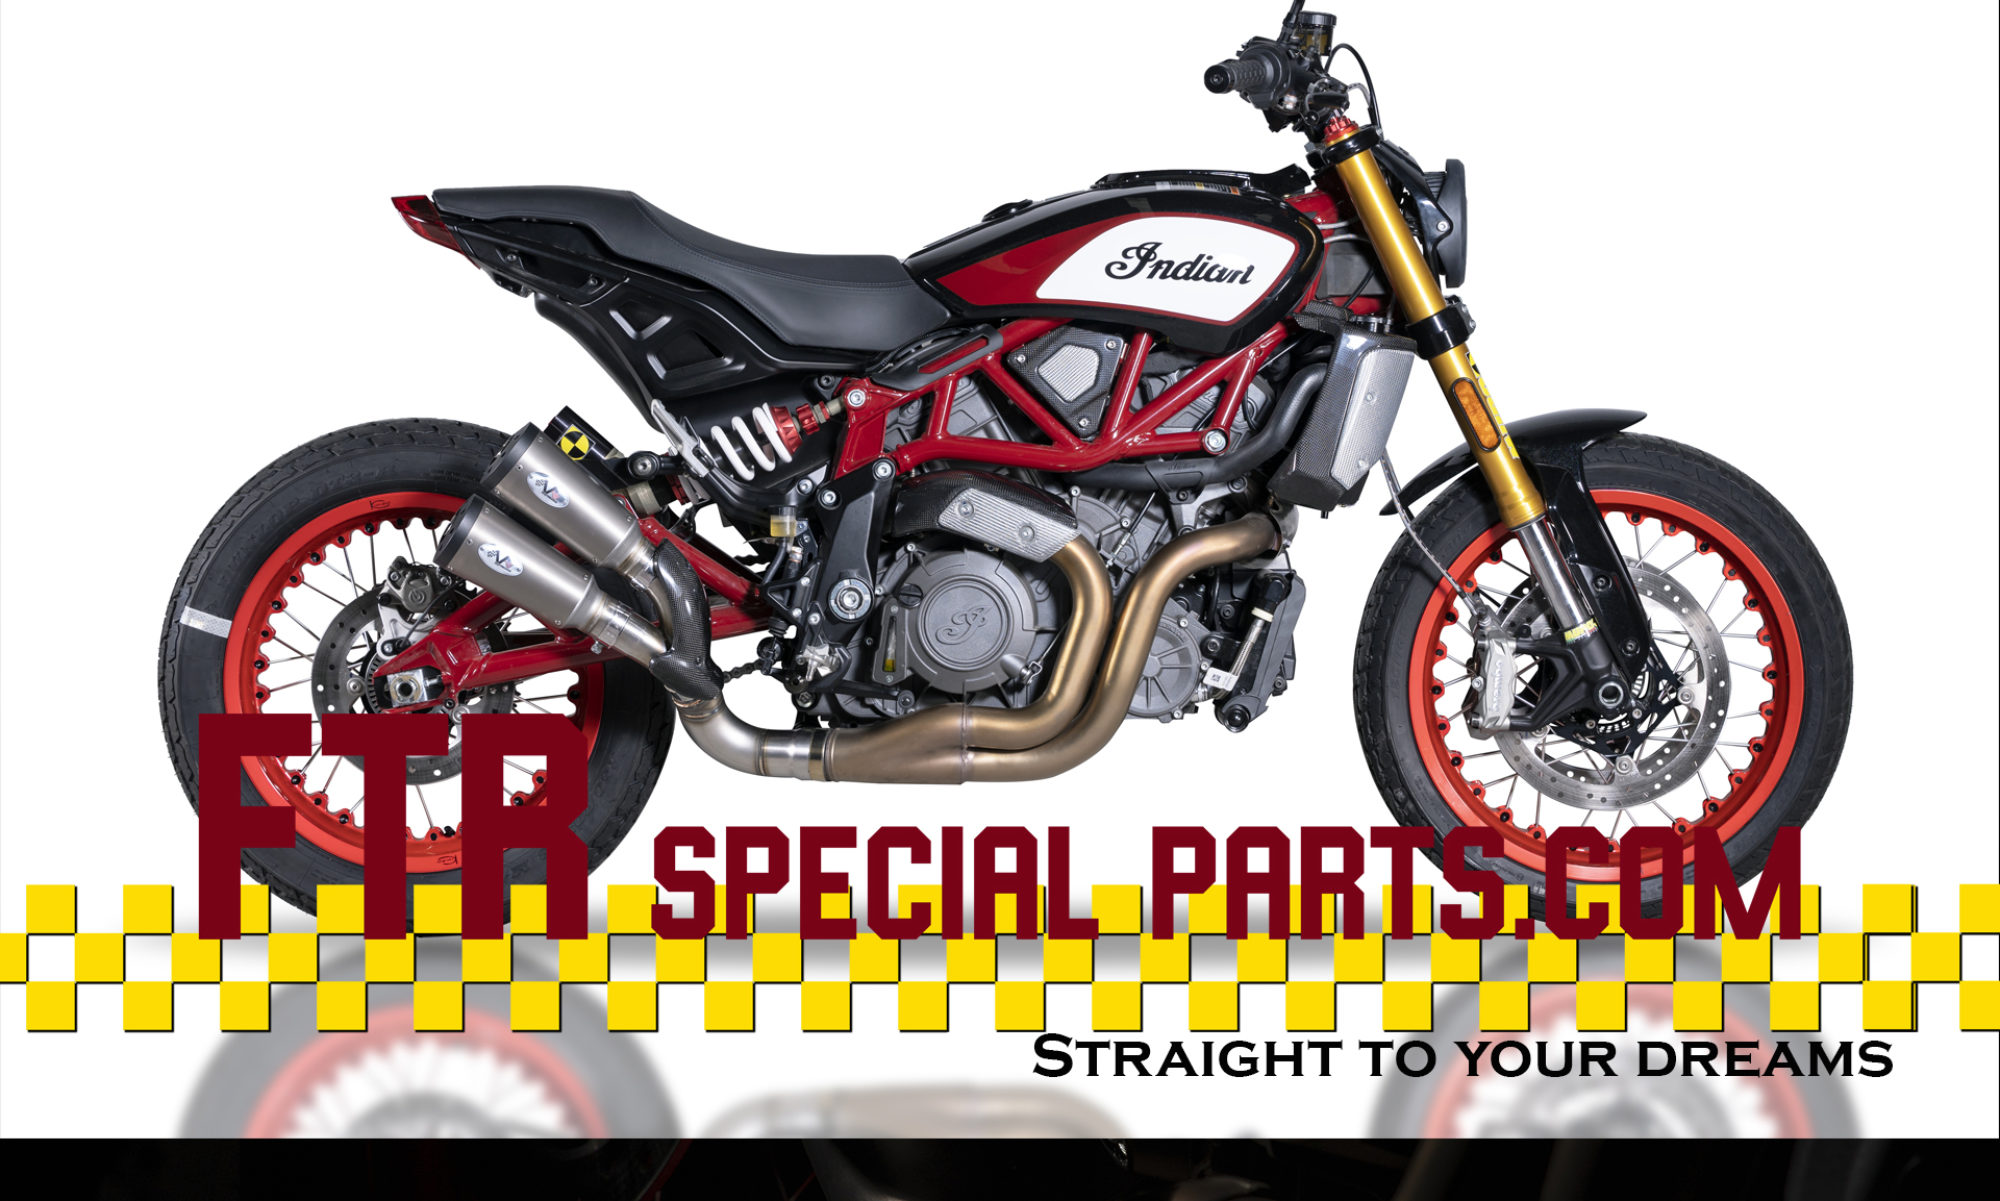 FTR Special Parts